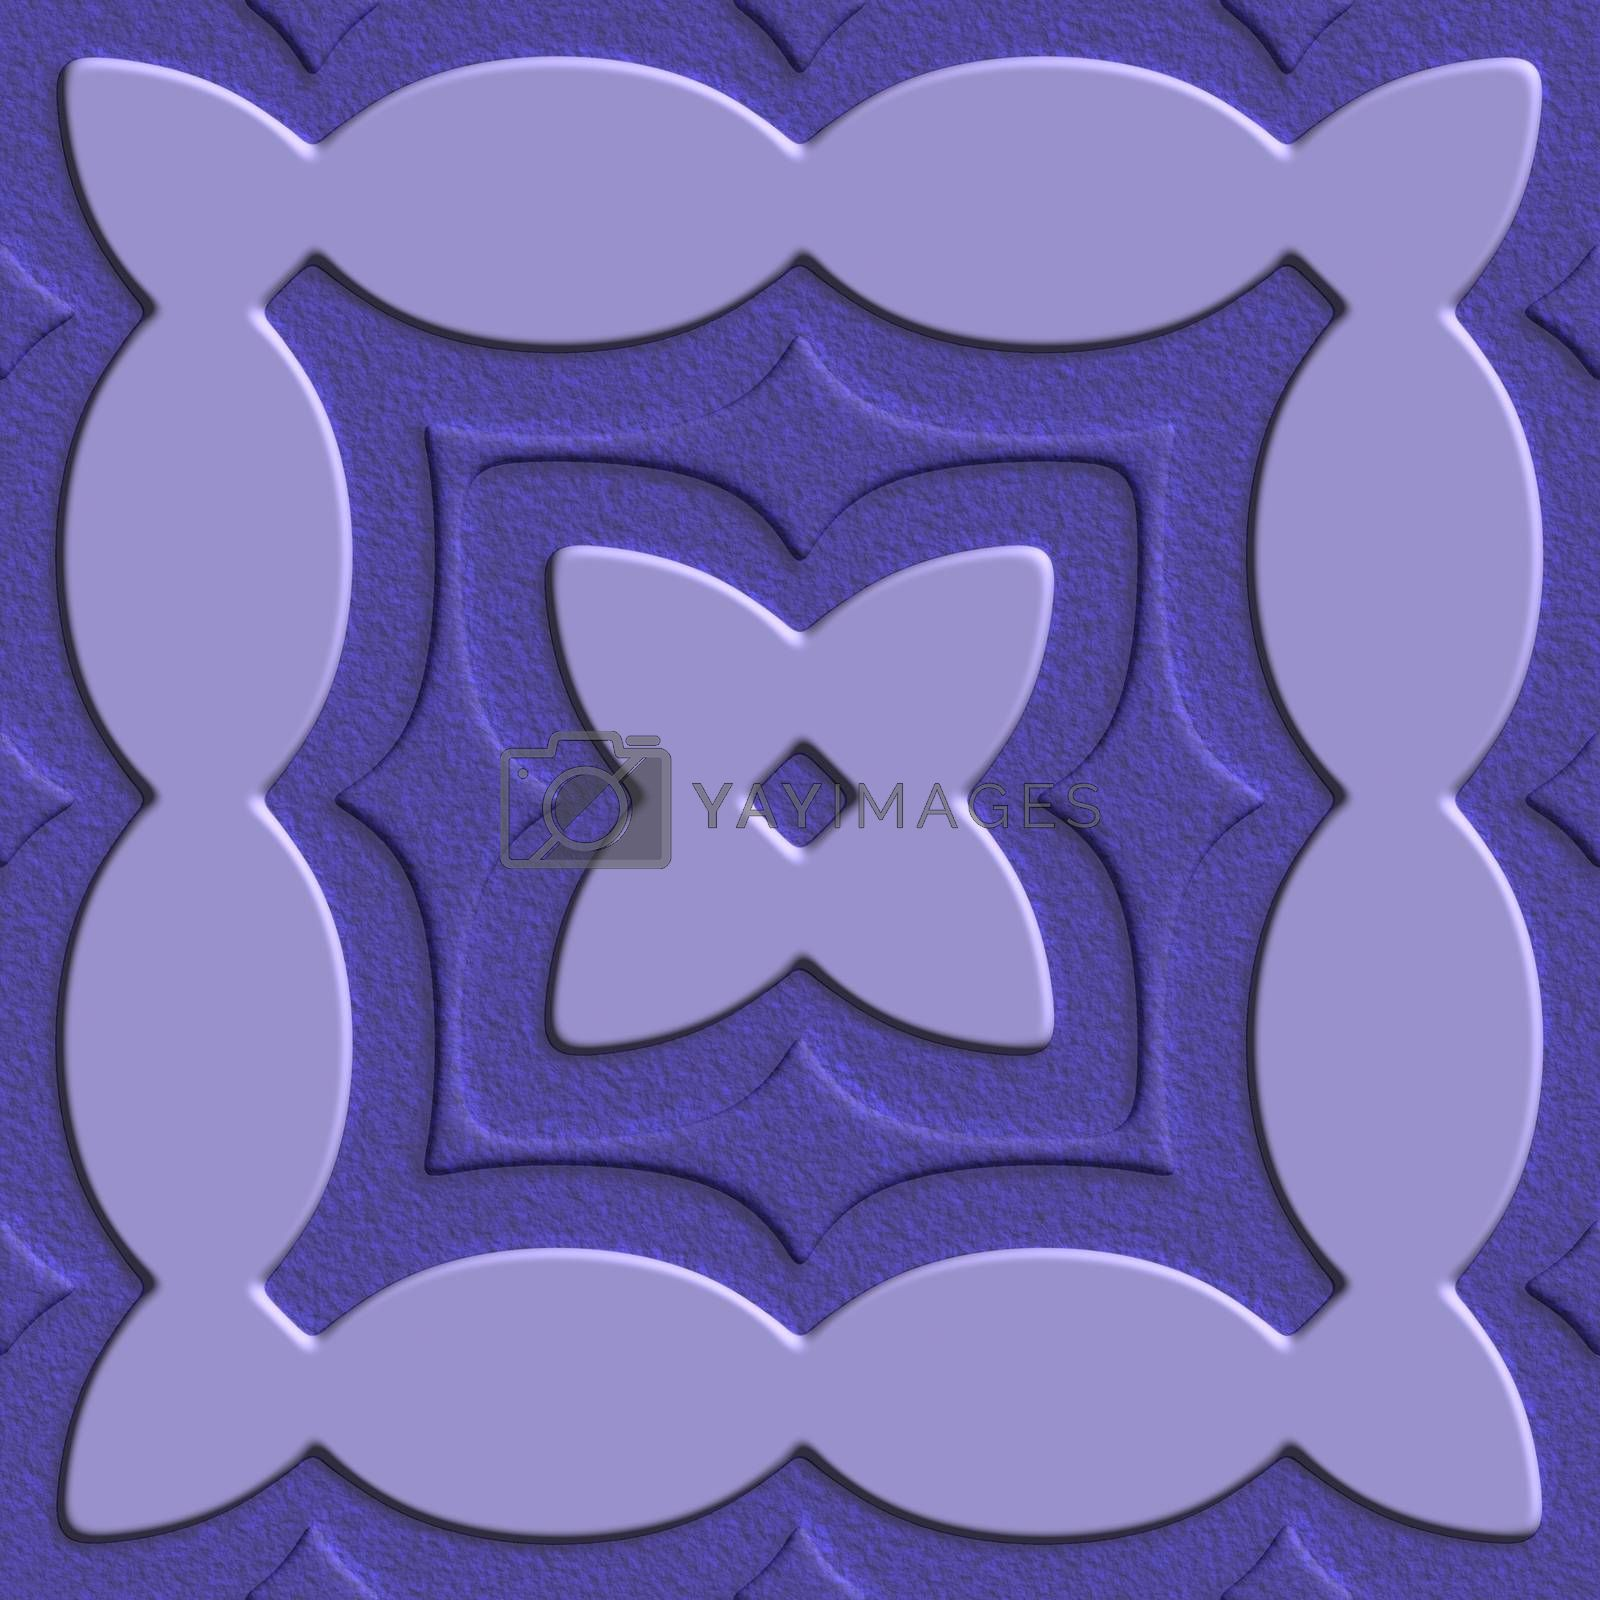 Royalty free image of seamless0129_13 by gallofoto